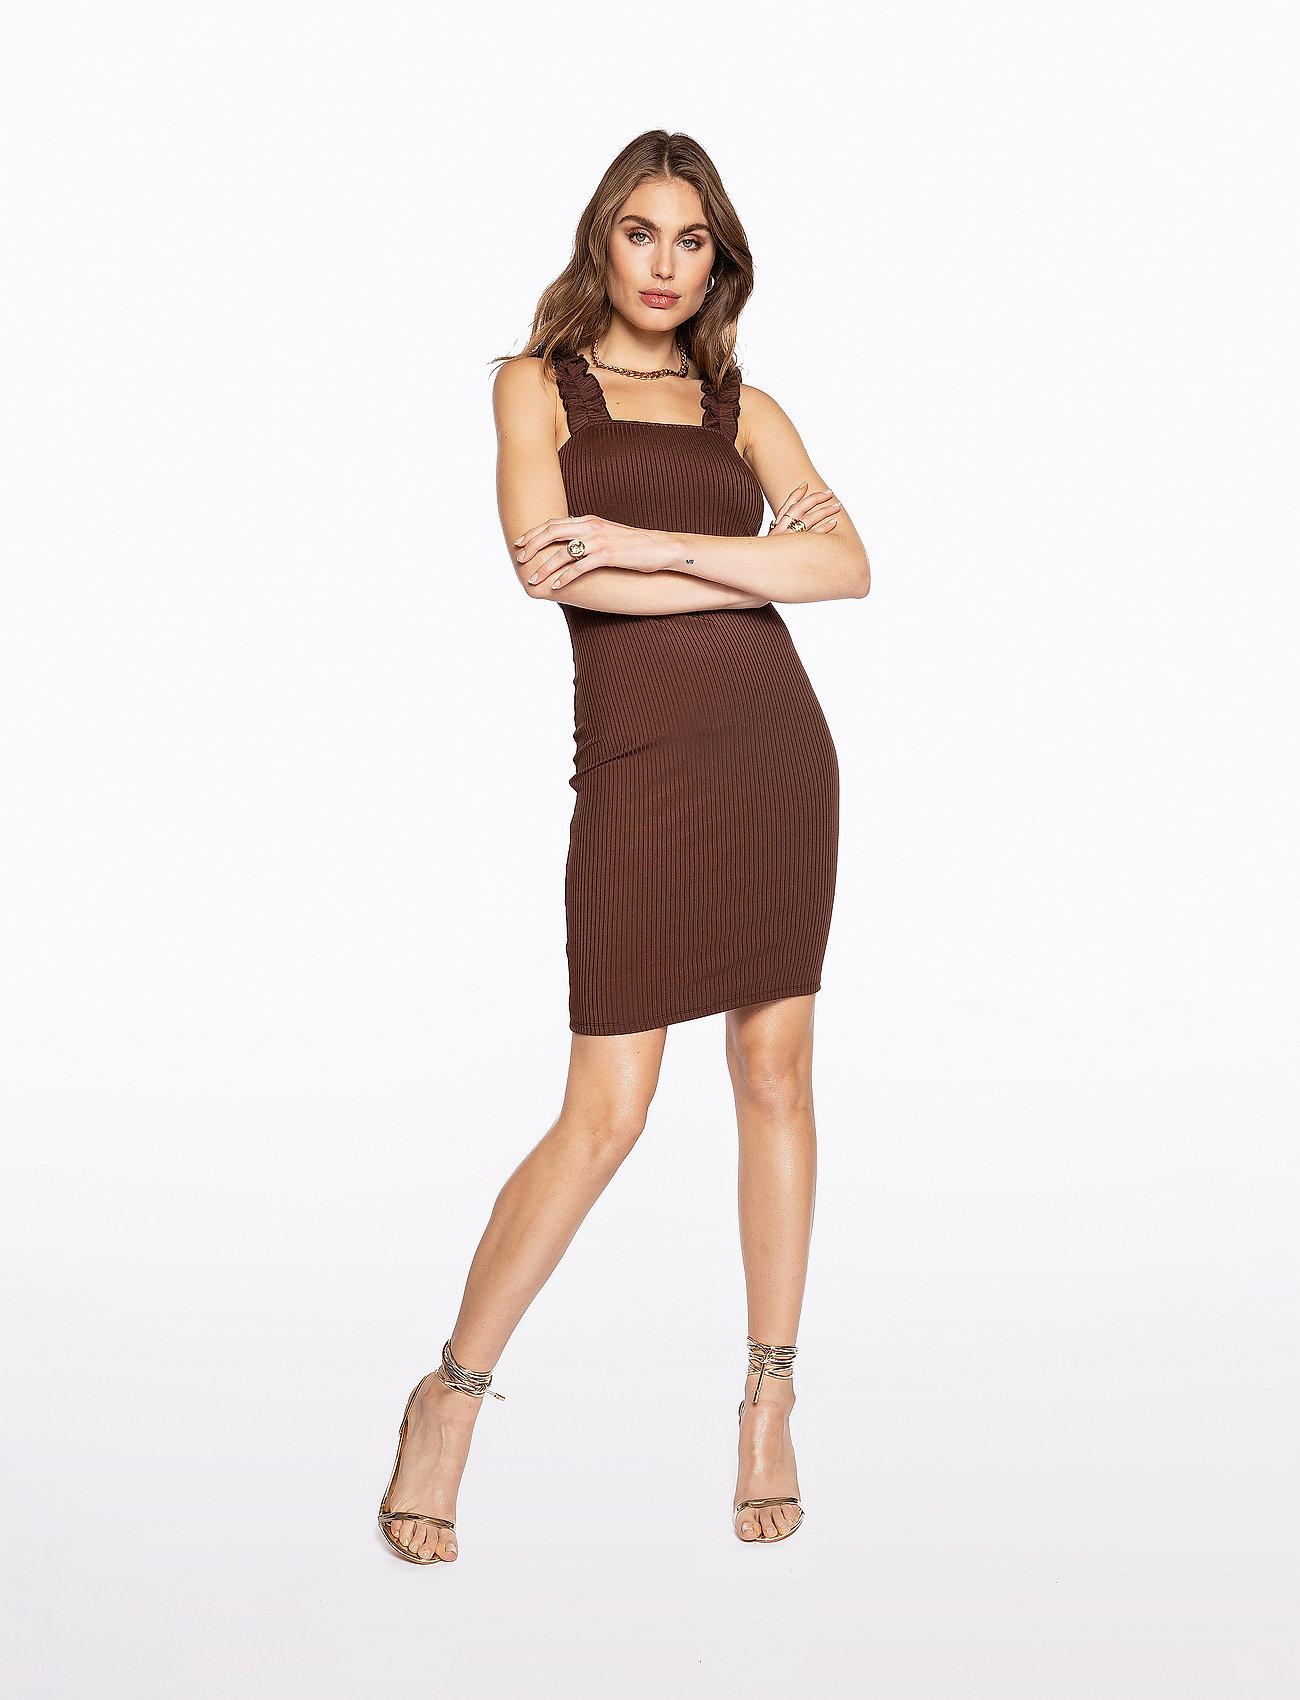 Ivyrevel - FRILL SHOULDER RIB DRESS - robes moulantes - brown - 0